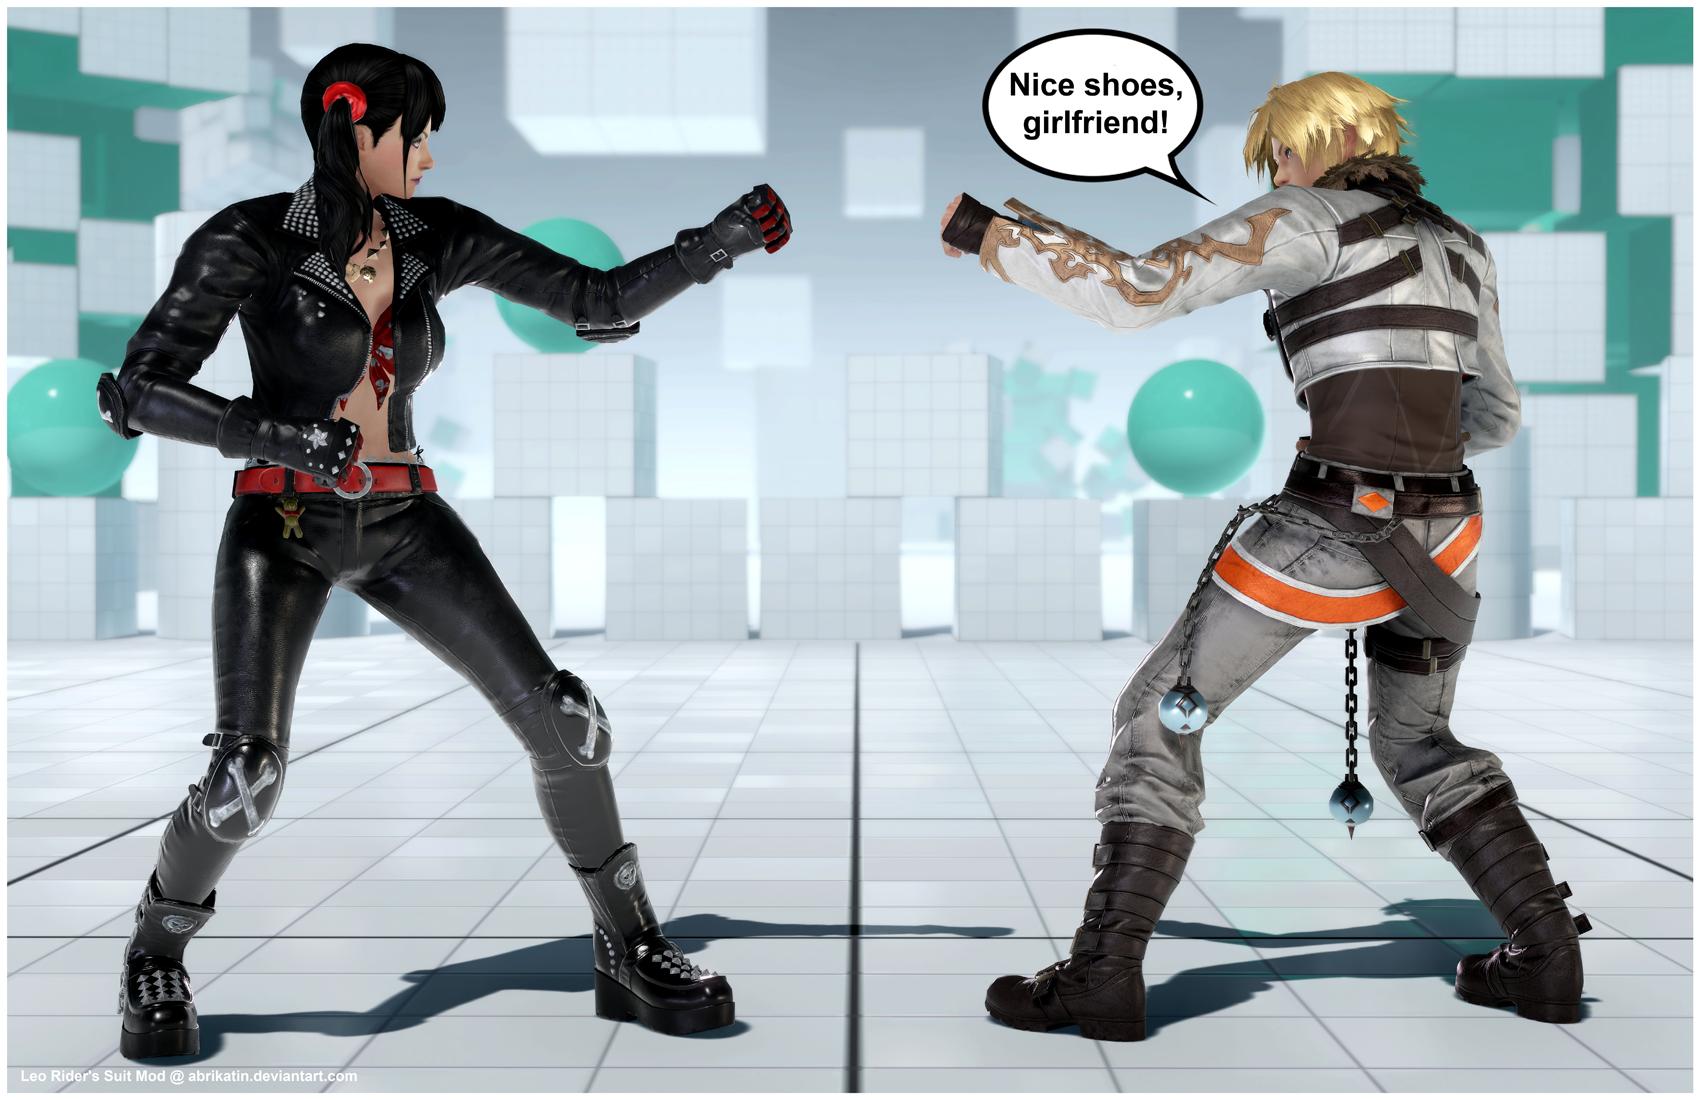 Leo Rider's Suit [Tekken 7 PC mod] by Abrikatin